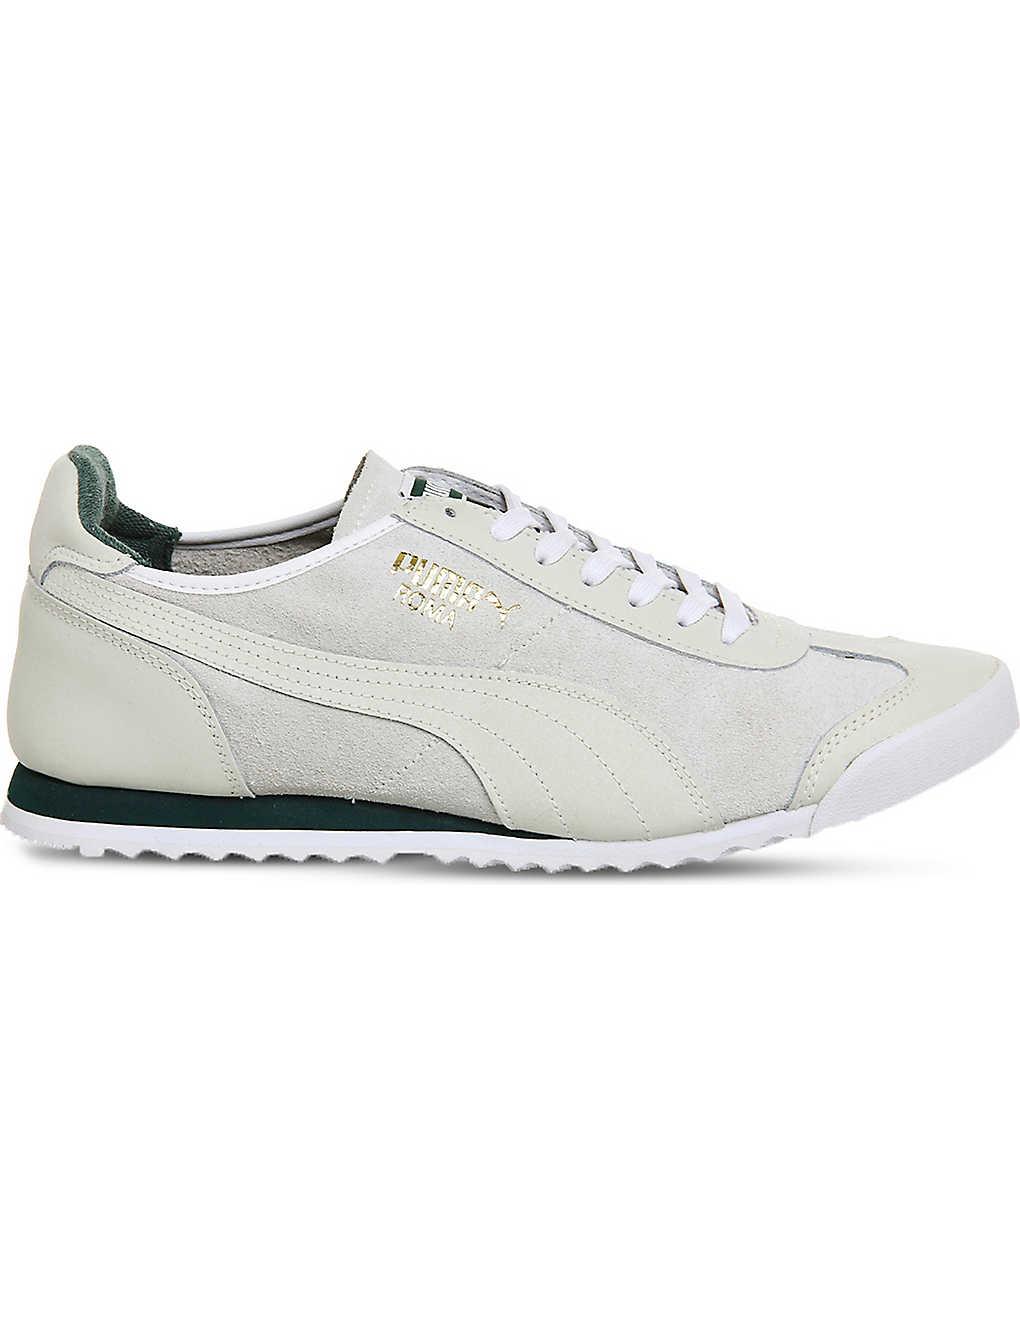 best website 81fb0 098e4 PUMA - Roma suede and leather trainers | Selfridges.com